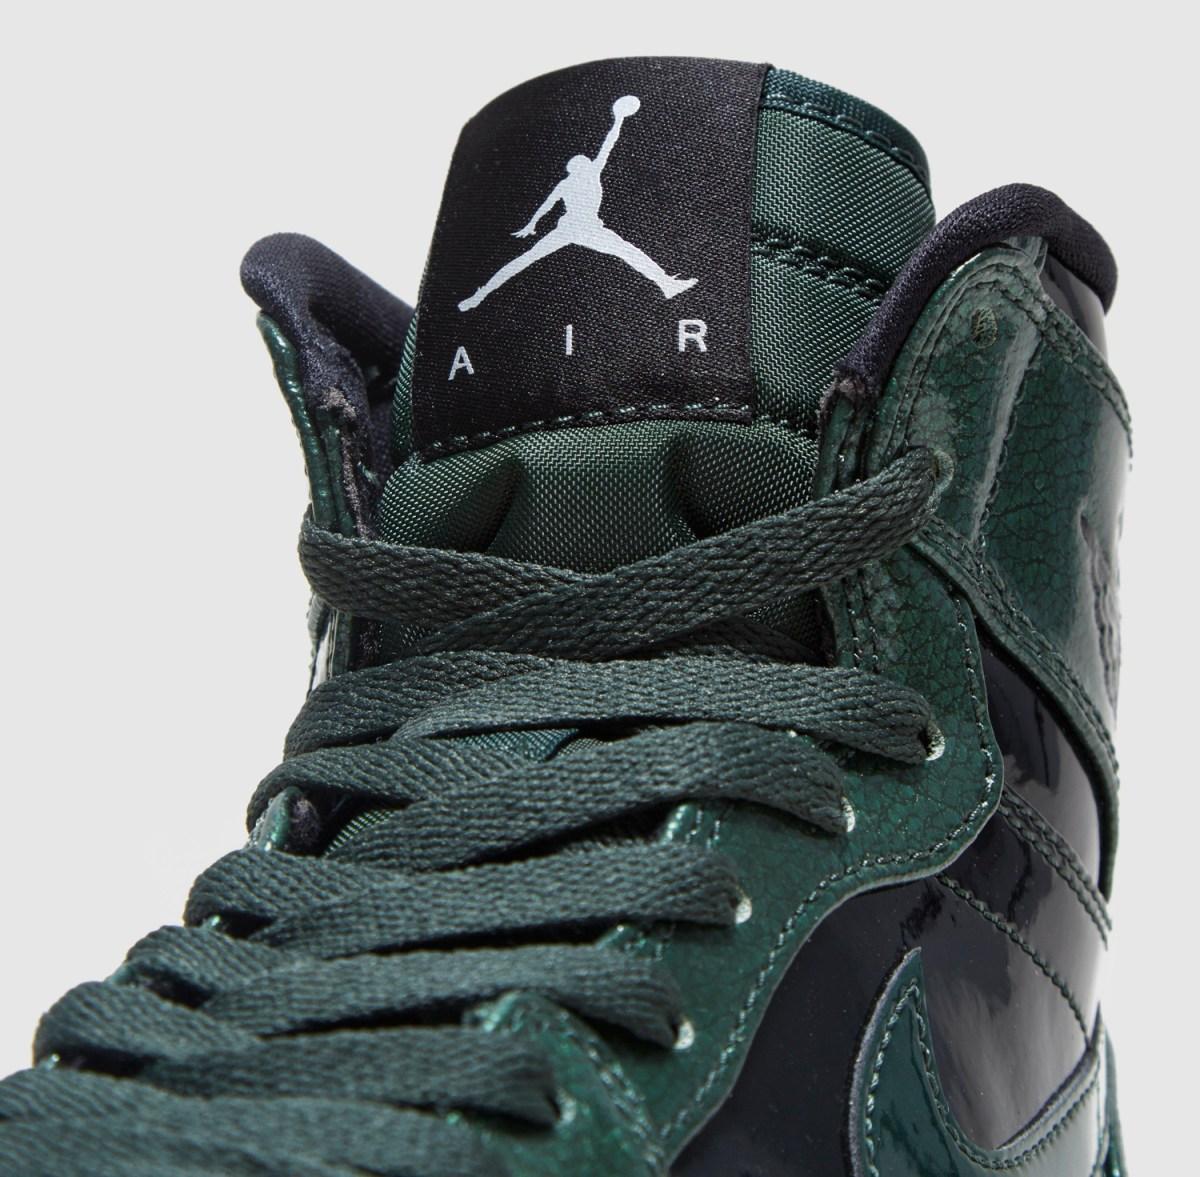 Air Jordan 1 Gorge Green Patent Leather 332550-300 Tongue